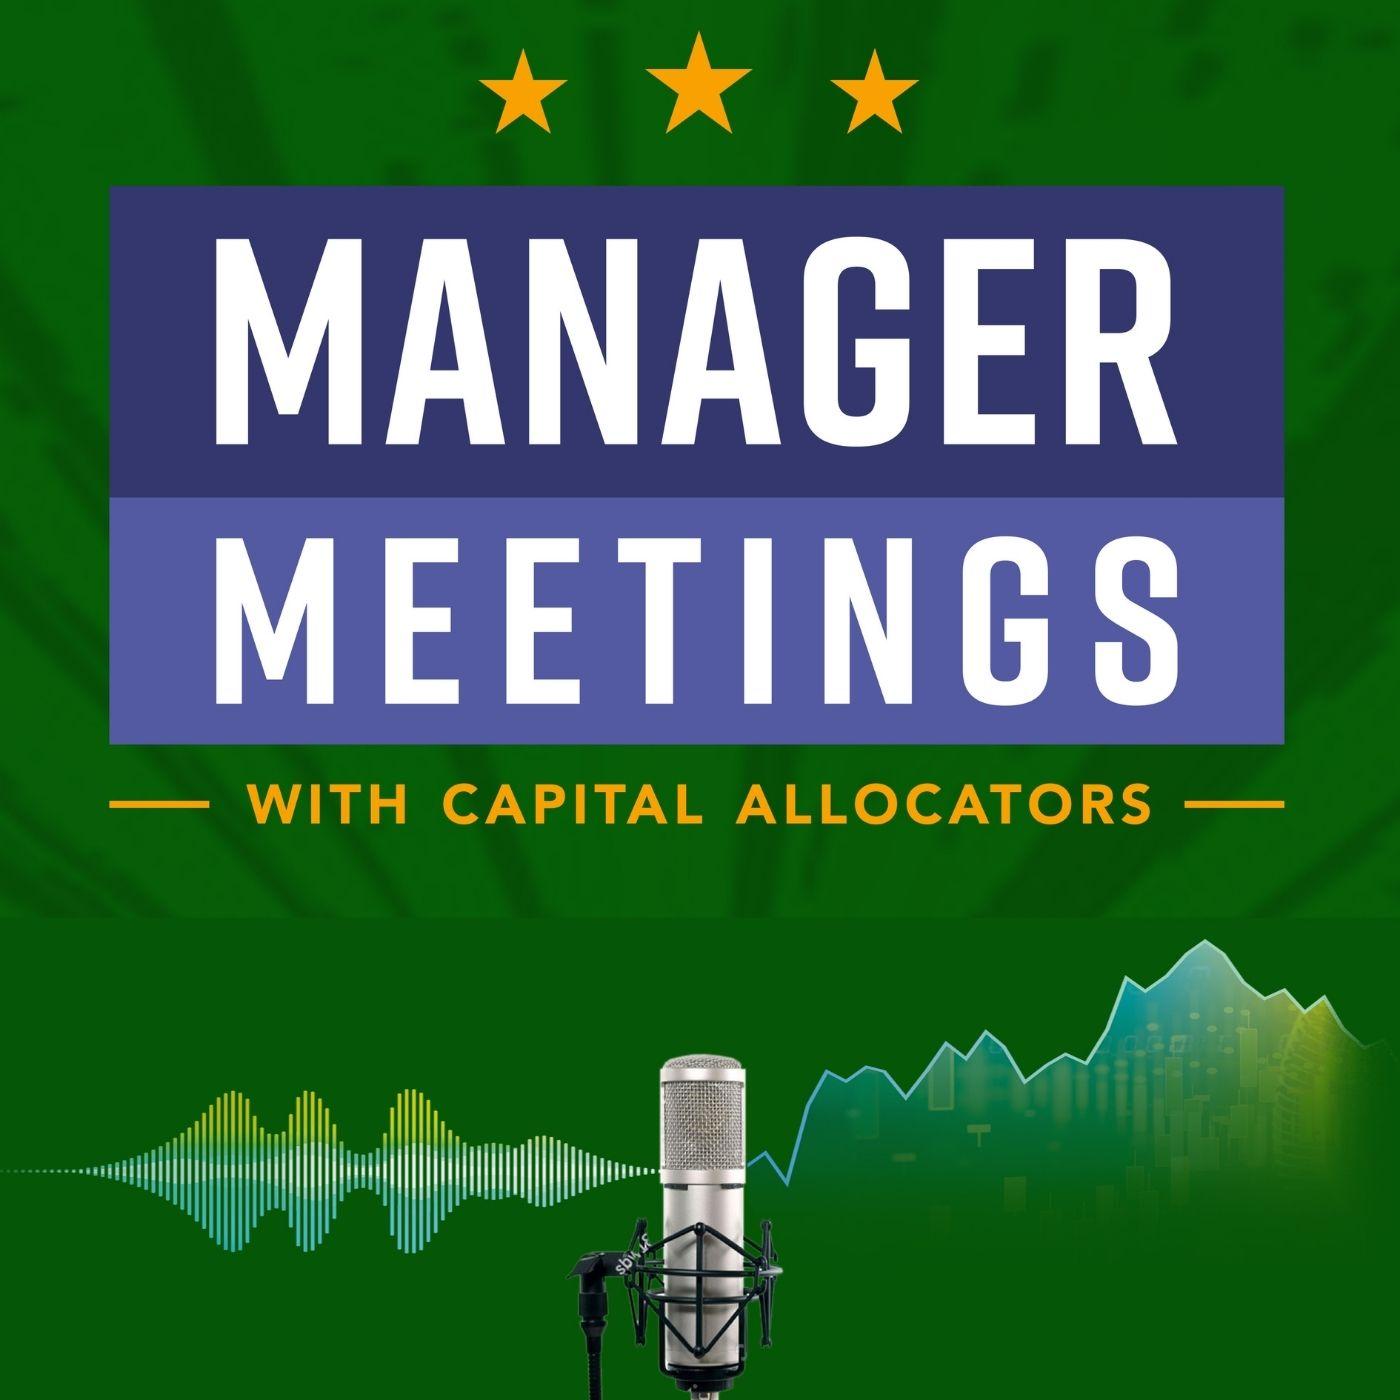 Daniel Graña – Janus Henderson Investors Emerging Markets Equity (Manager Meetings, EP.13)